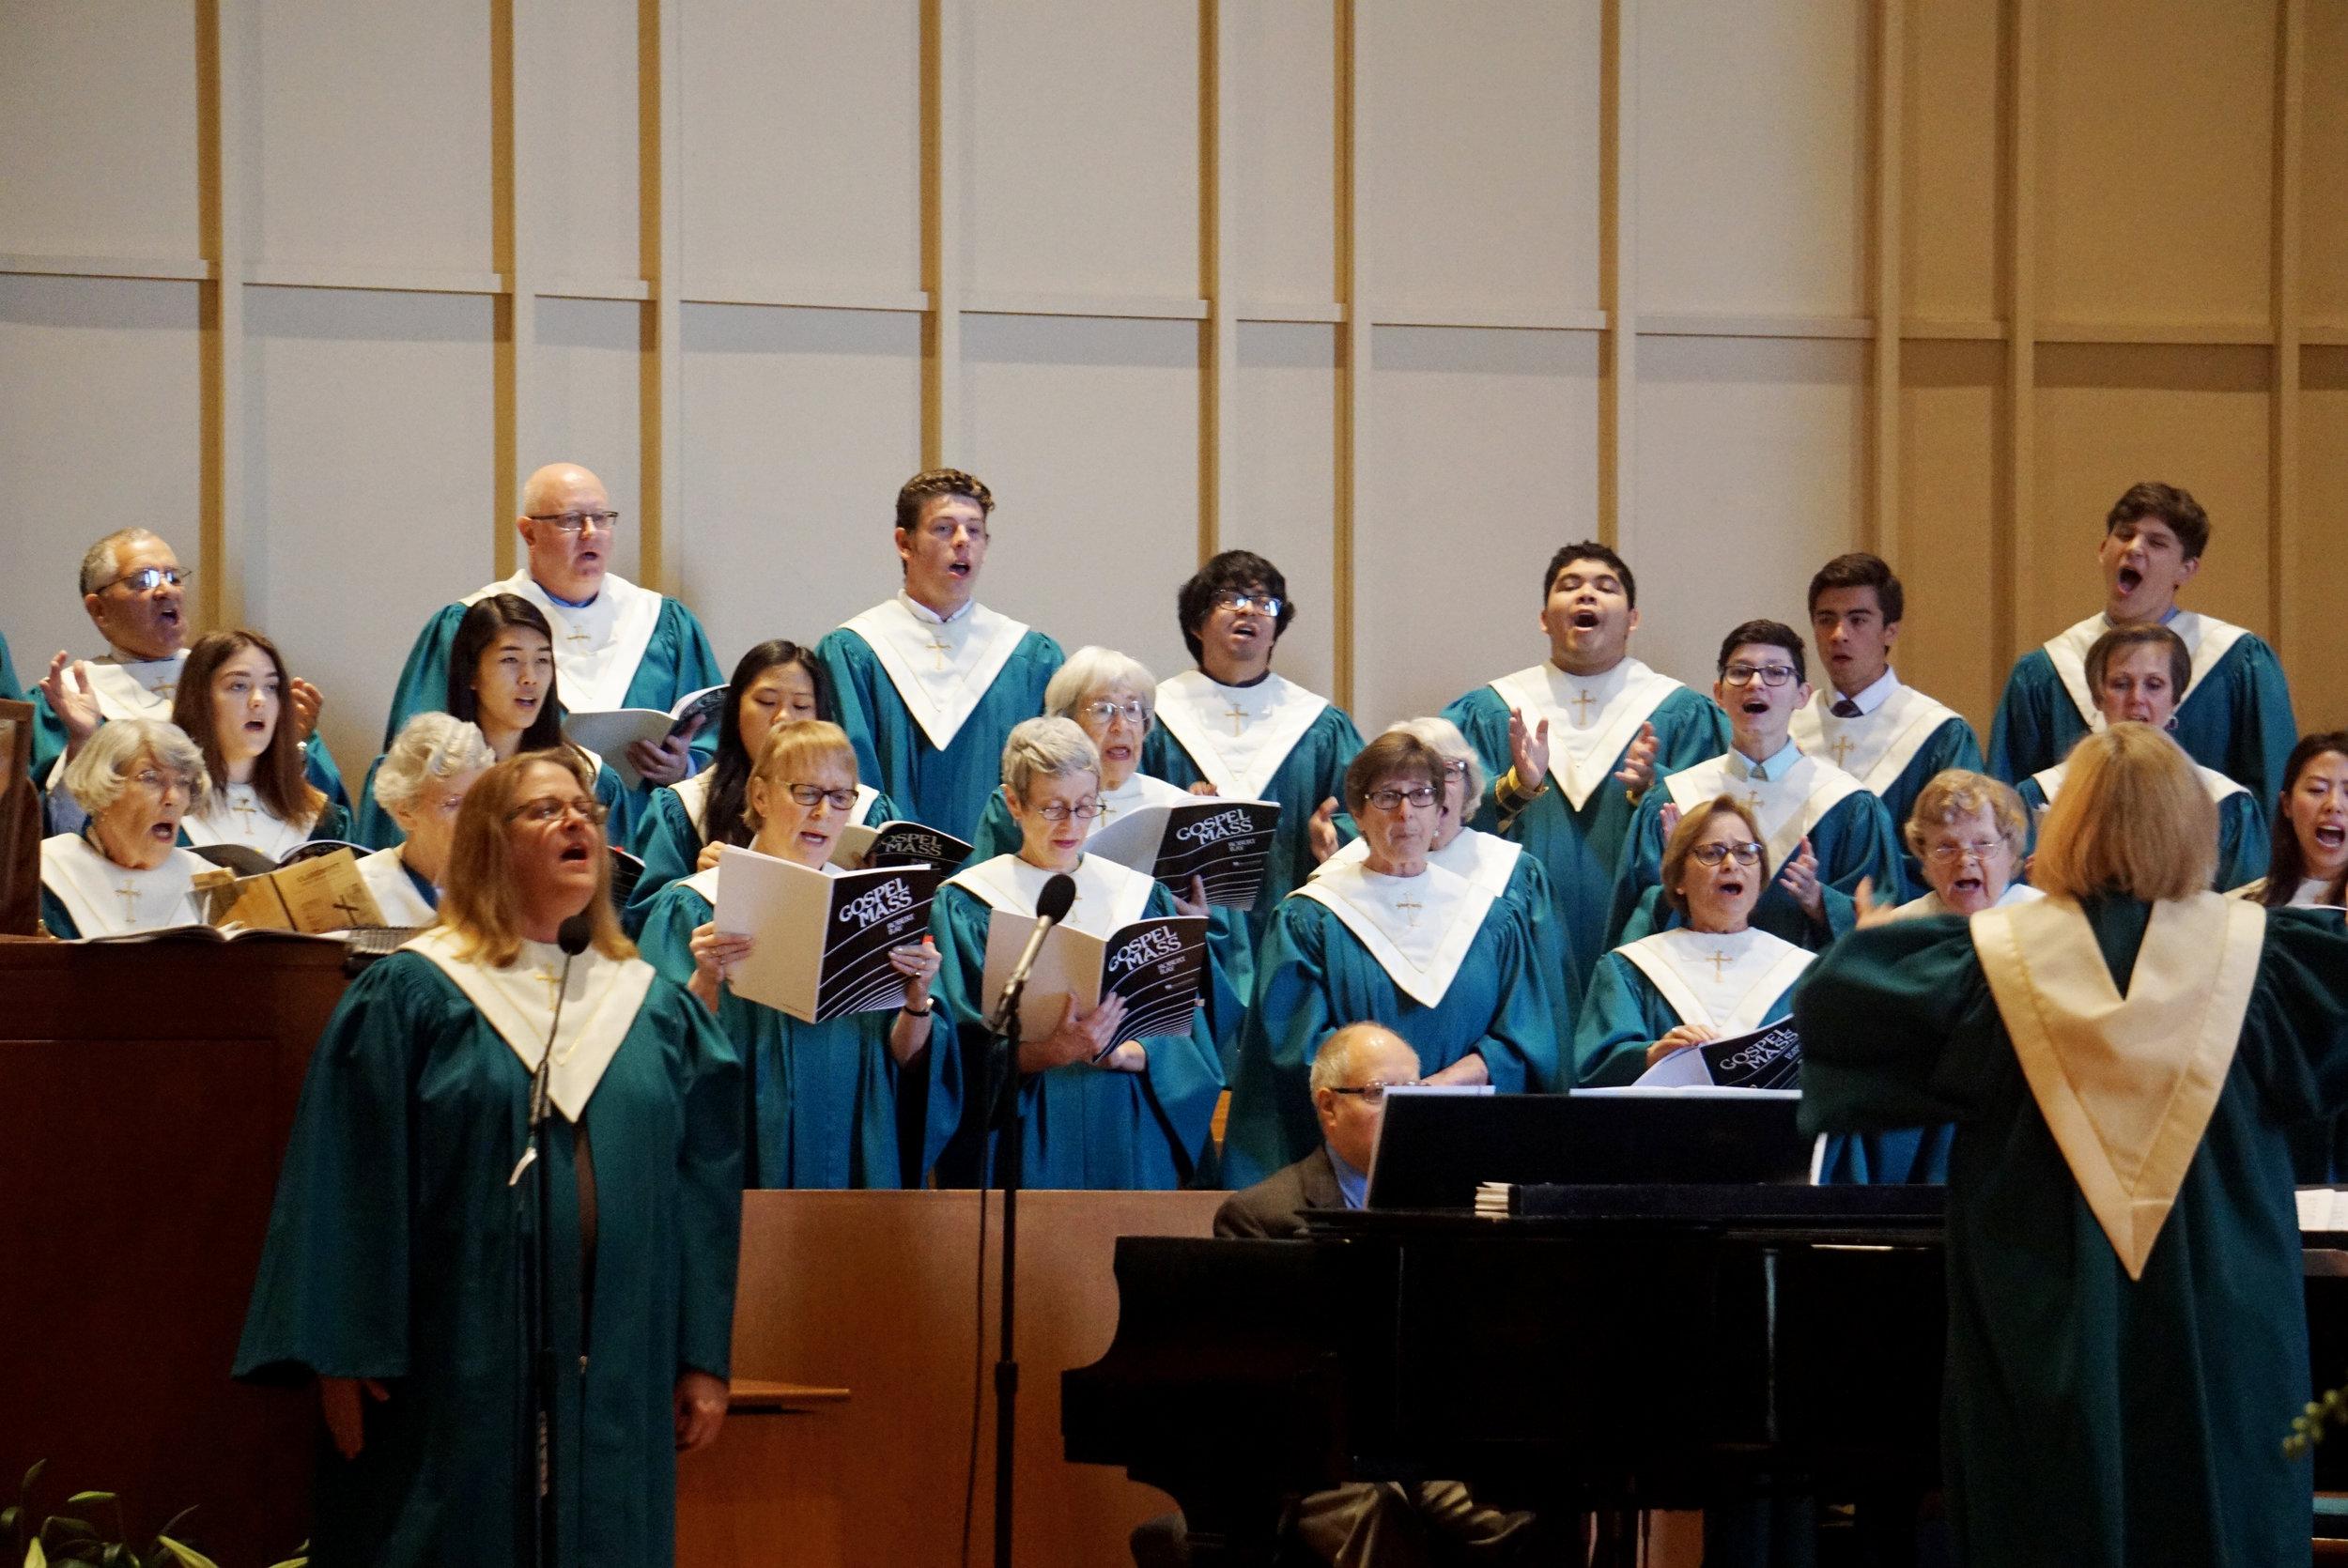 claremont-presbyterian-church-easter-choir-8.jpg